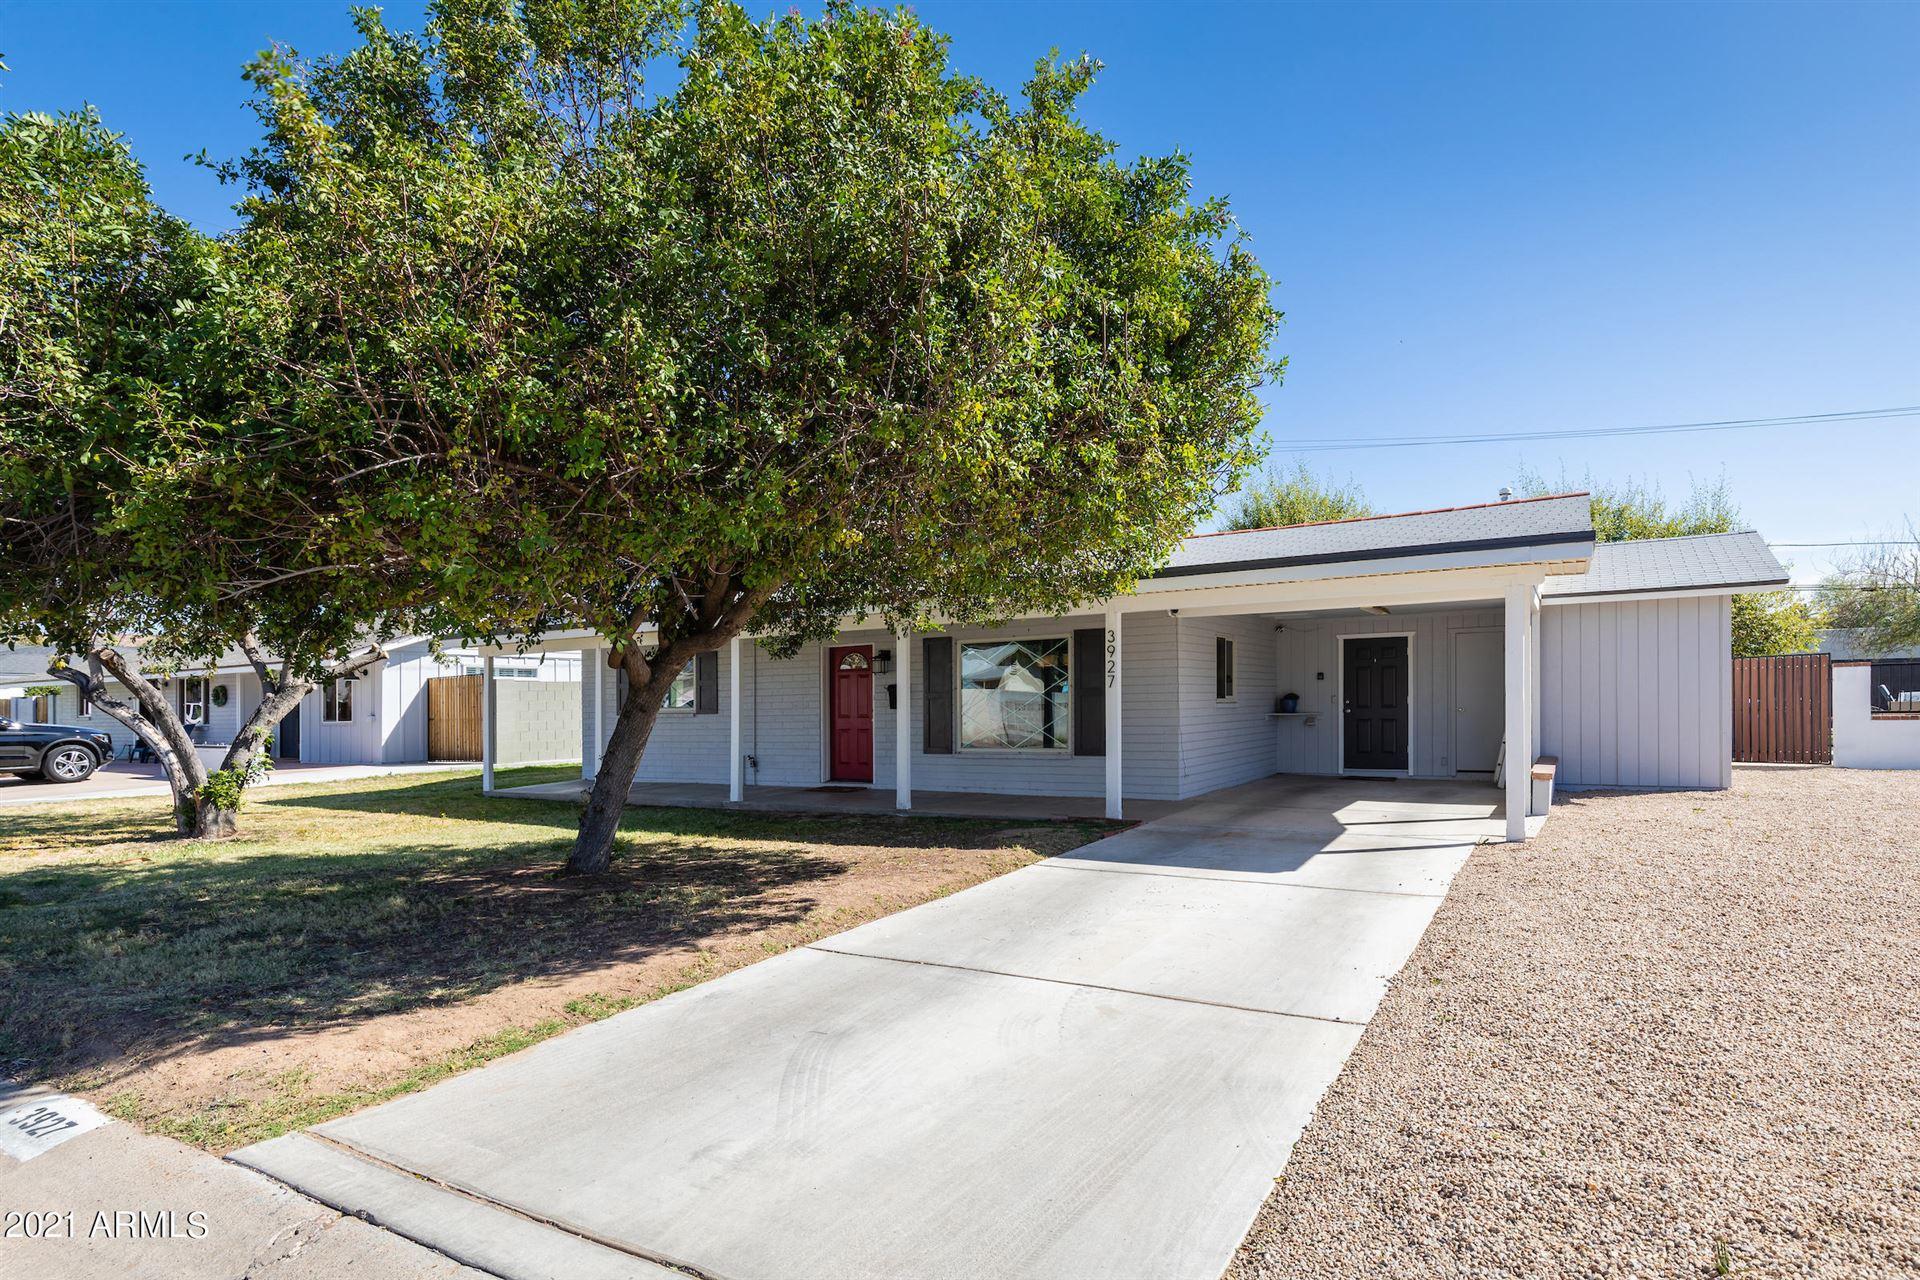 Photo of 3927 N 43RD Street, Phoenix, AZ 85018 (MLS # 6200736)